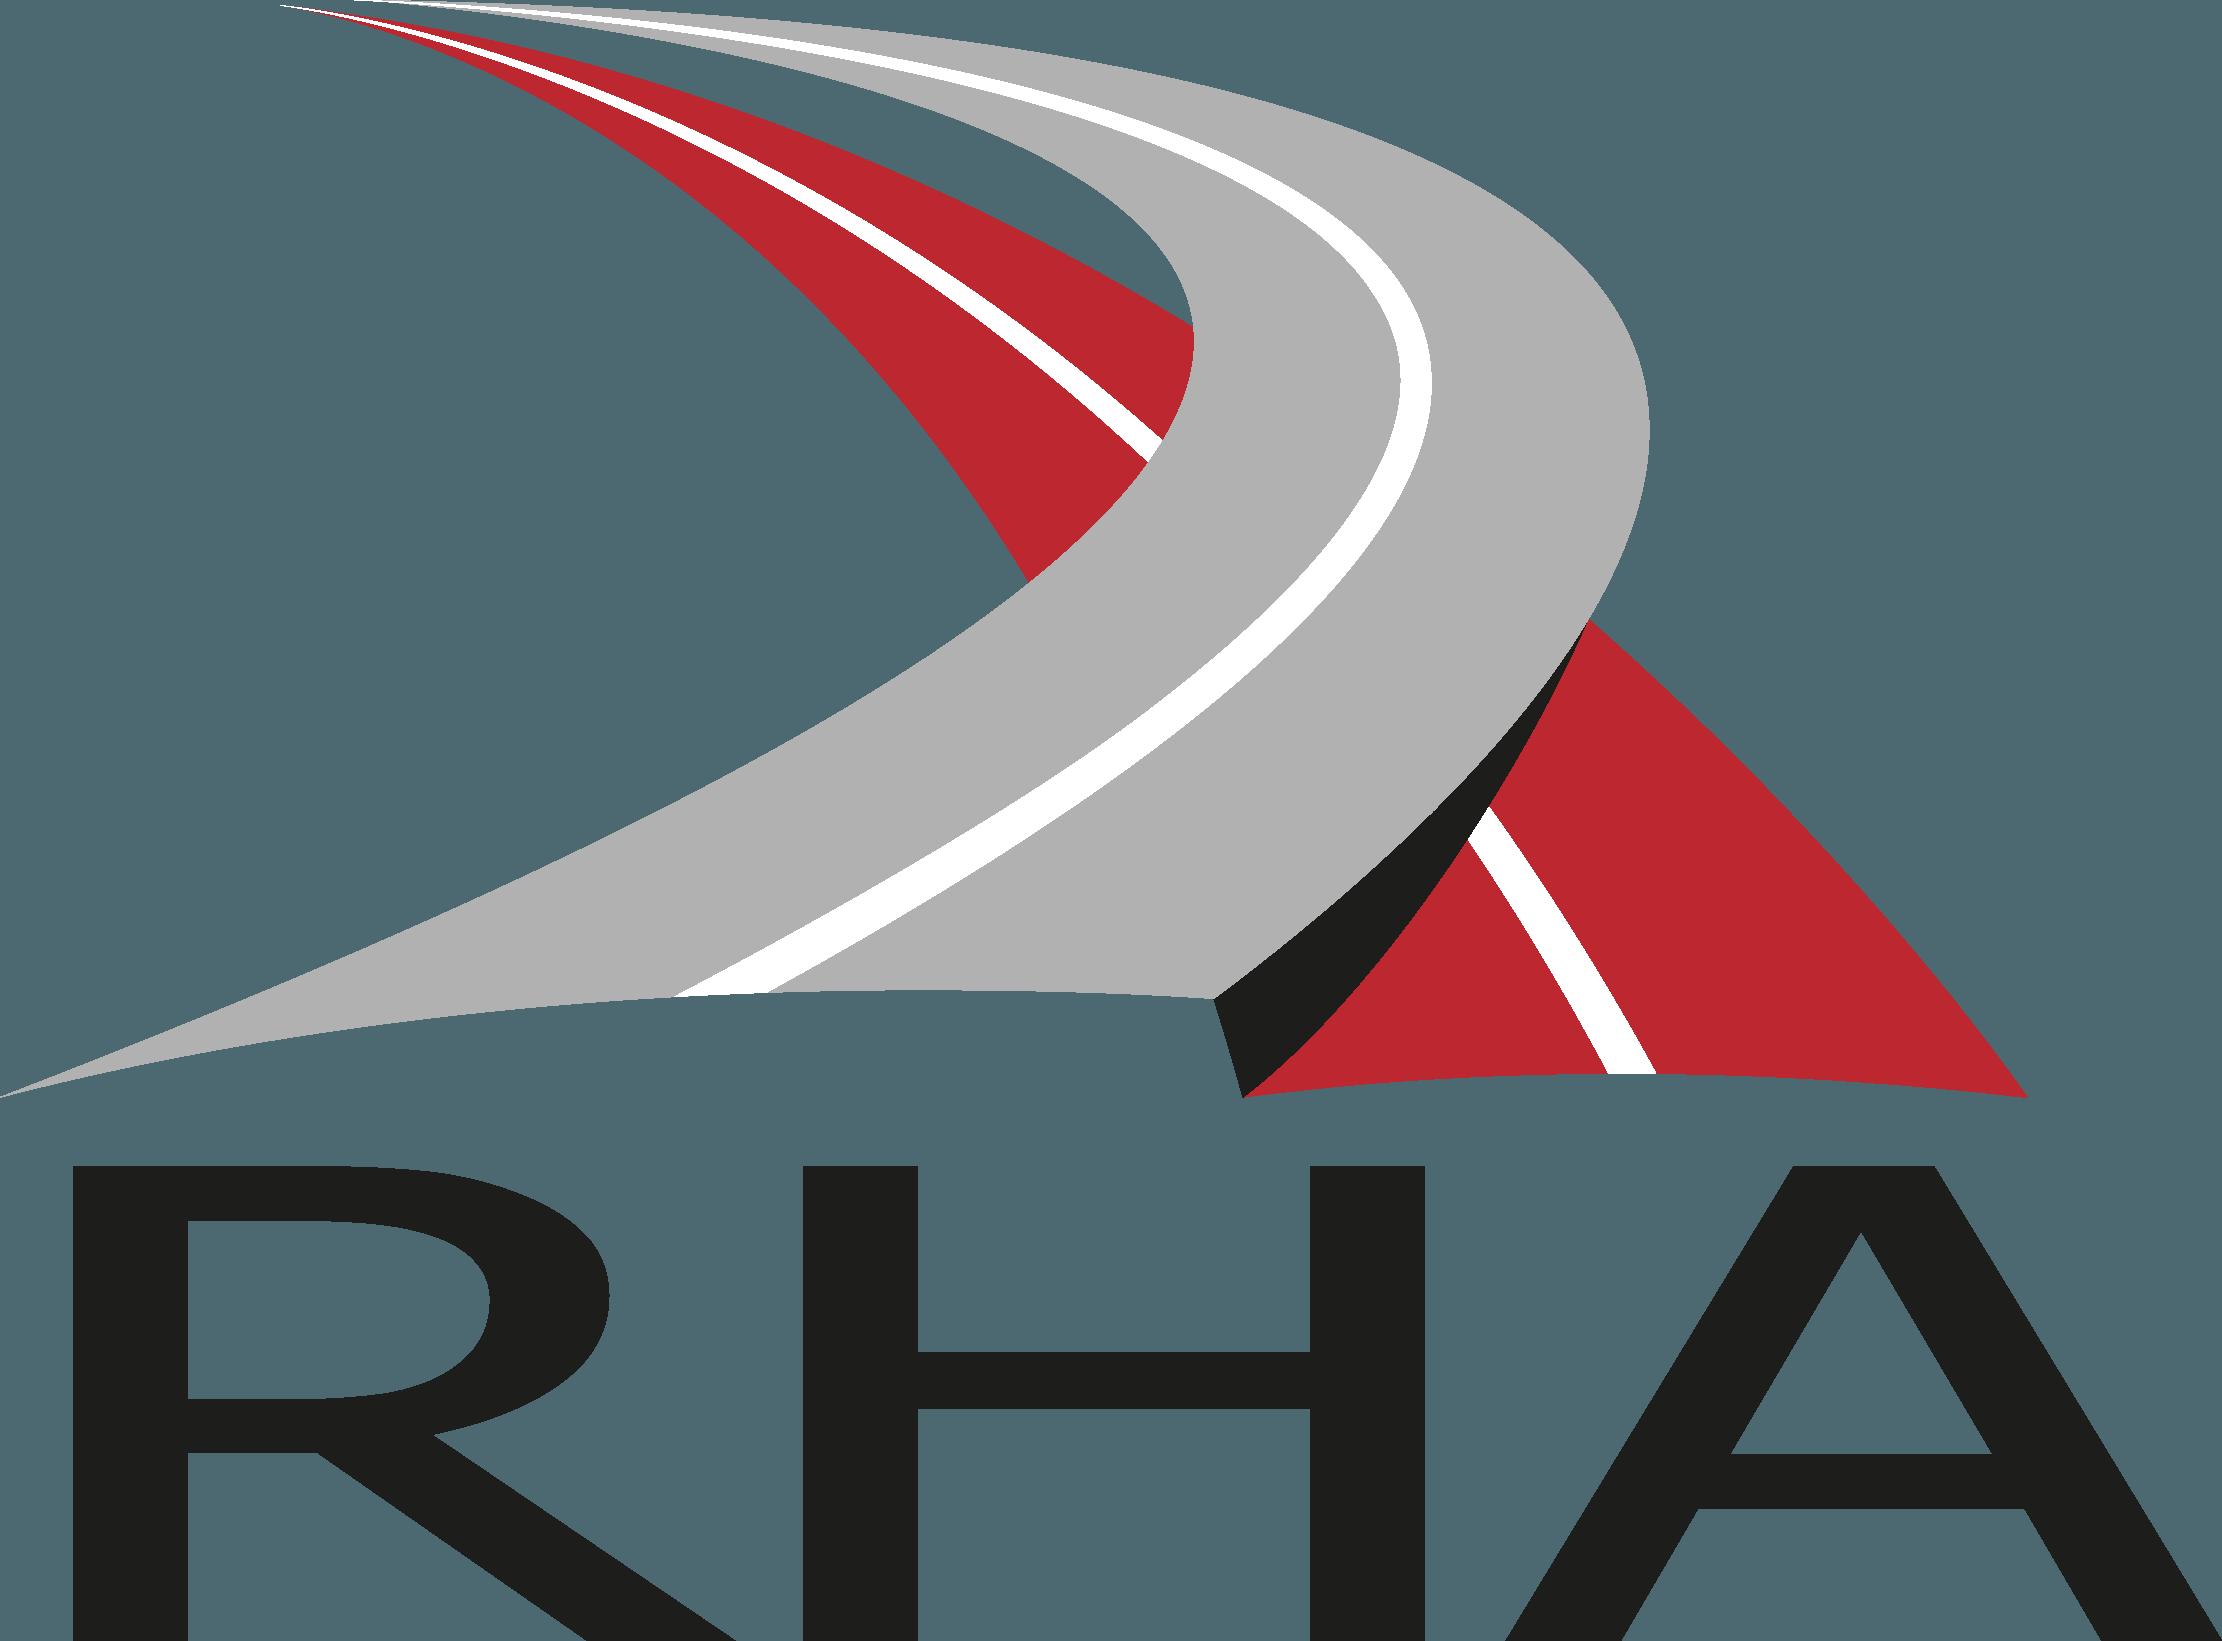 RHA Logo (Road Haulage Association) png